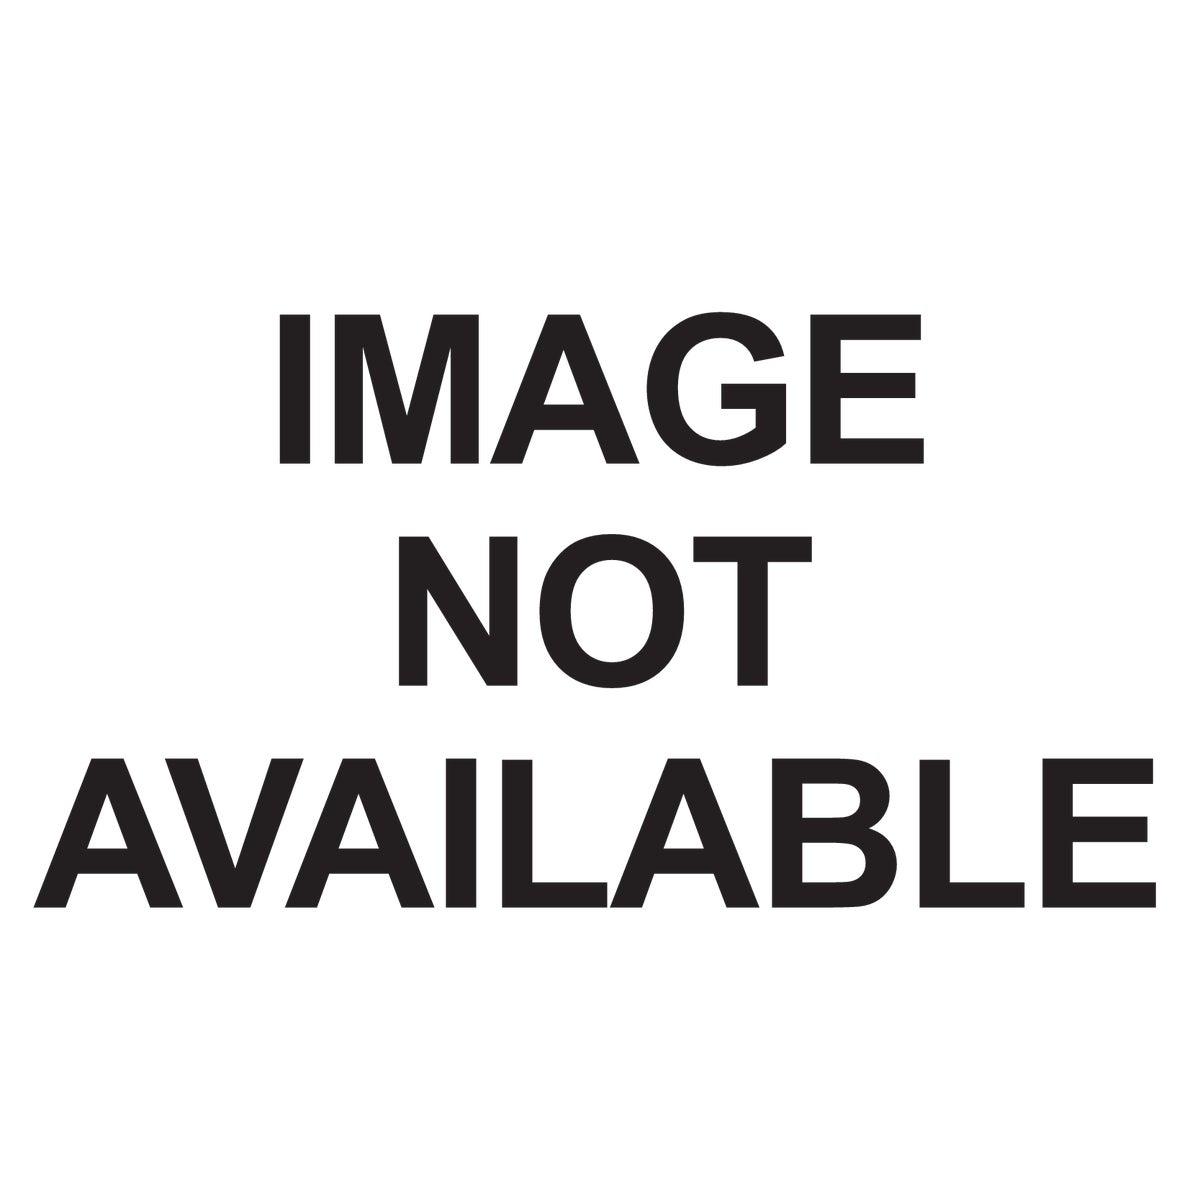 BLU MANIFOLD LABEL PLATE - P-1084 by Watts Regulator Co